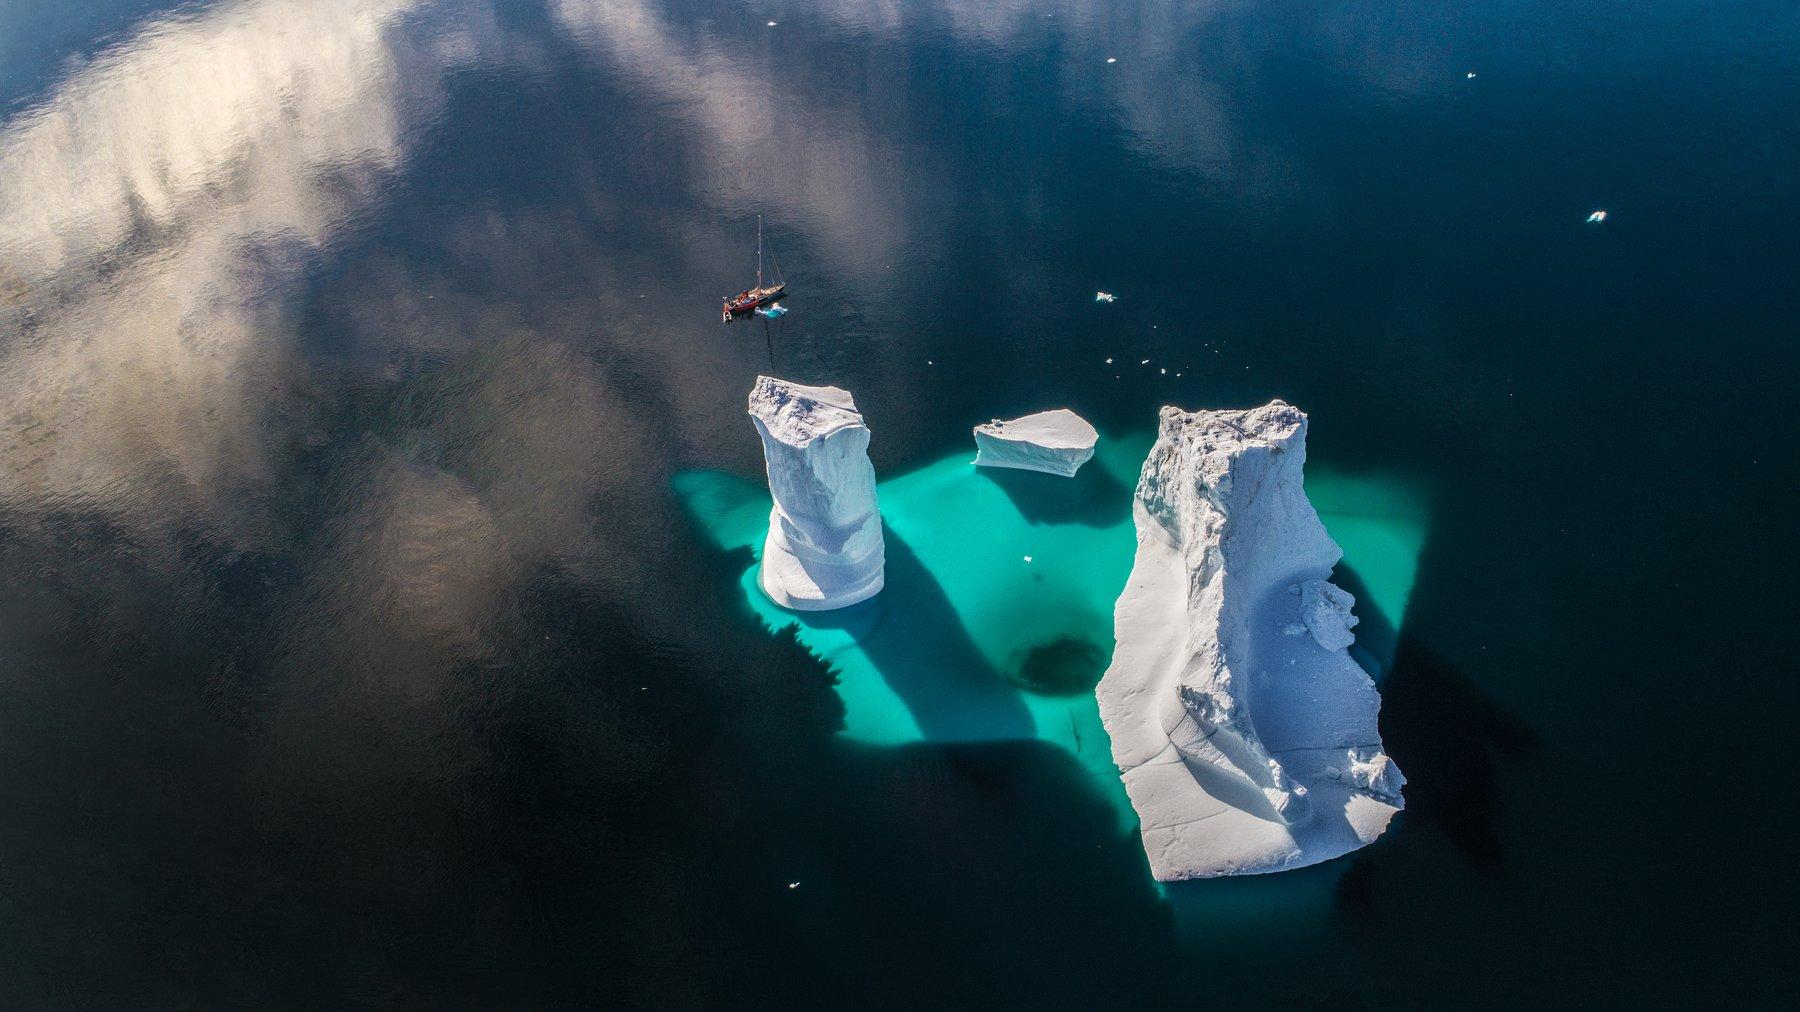 гренландия, айсберг, дрон, яхта, лодка, Алексей Сулоев